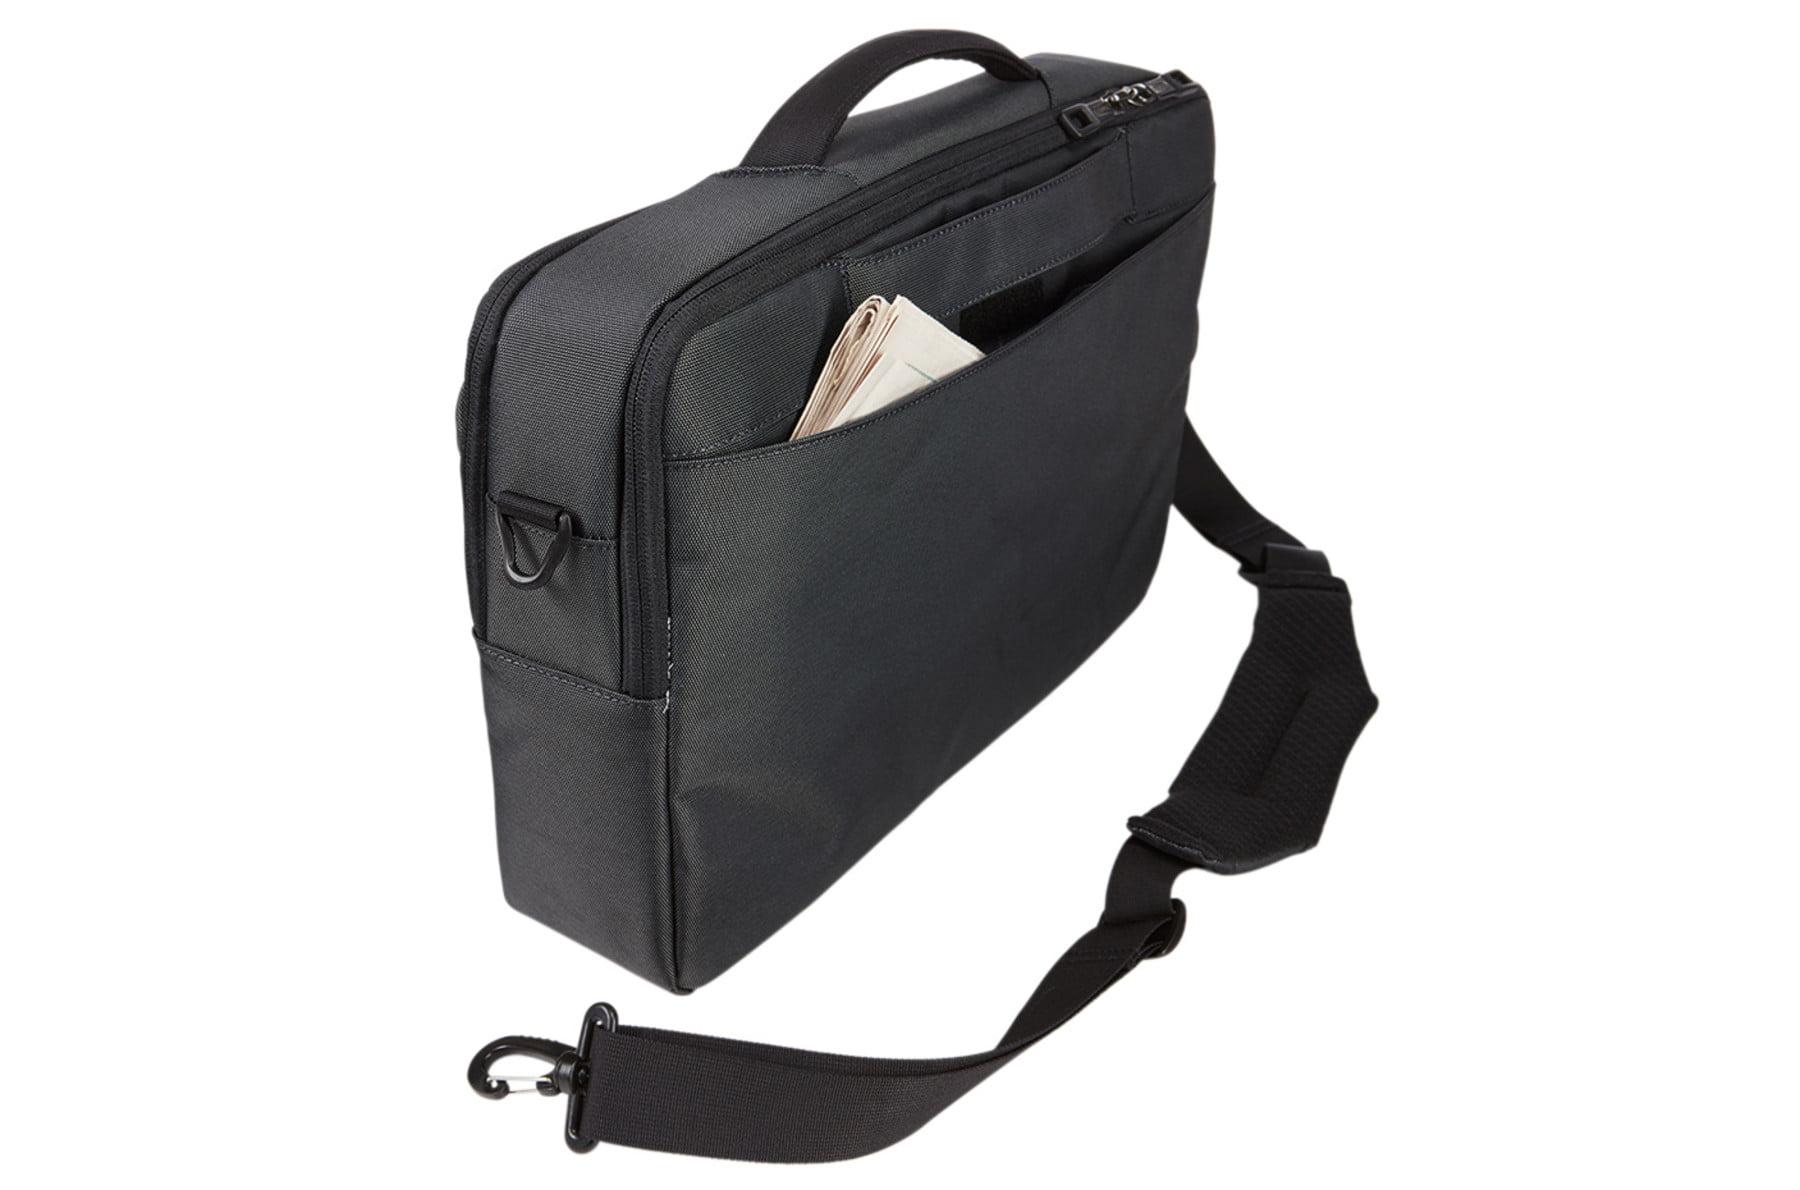 Geanta laptop Thule Subterra Laptop Bag 15.6 inchi 3